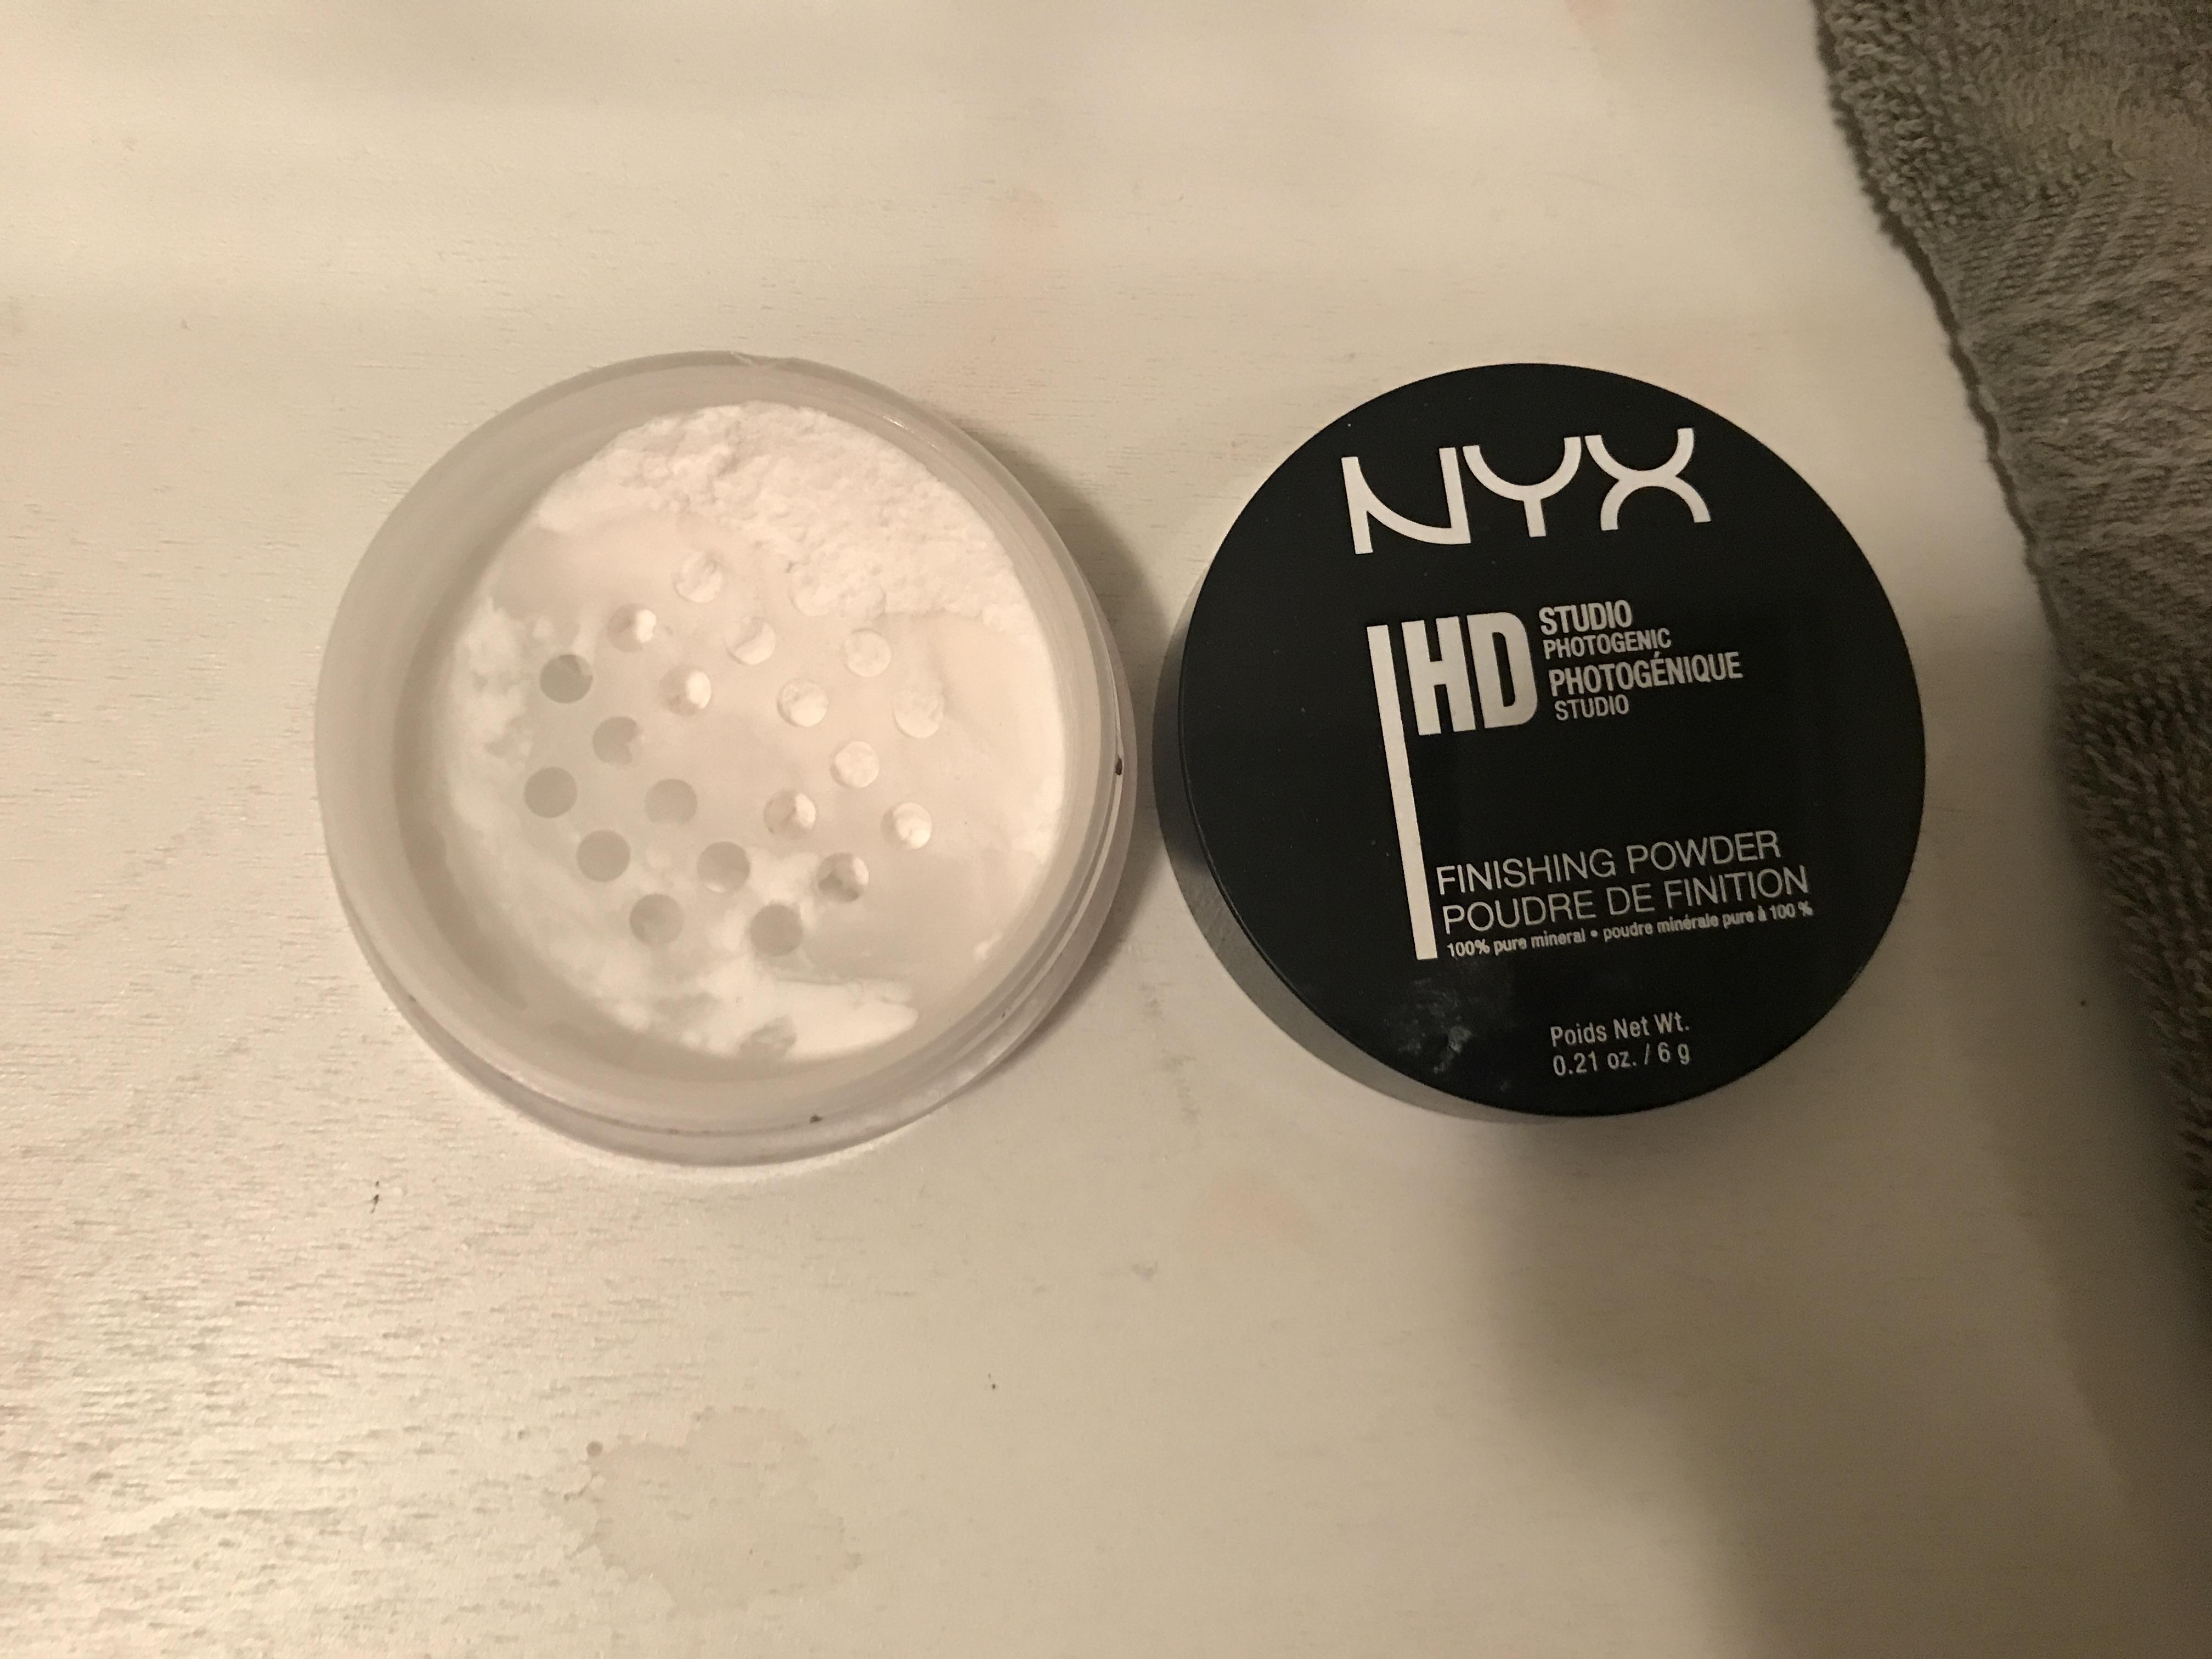 NYX Cosmetics Studio Finishing Powder uploaded by Alex D.